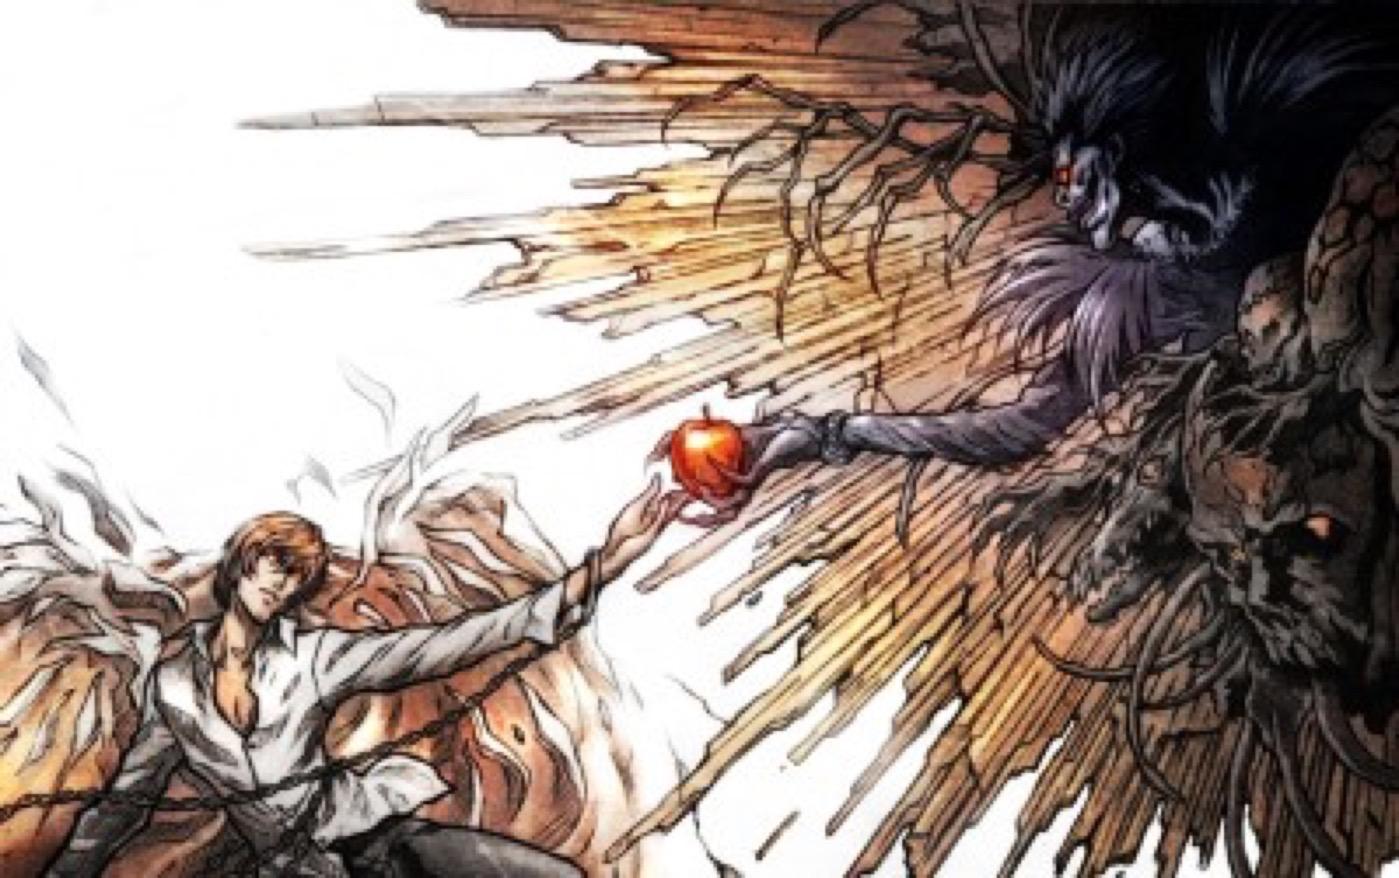 death_note_ryuk_yagami_light_apples_desktop_2229x1_by_gelatin95-d5sjwrs